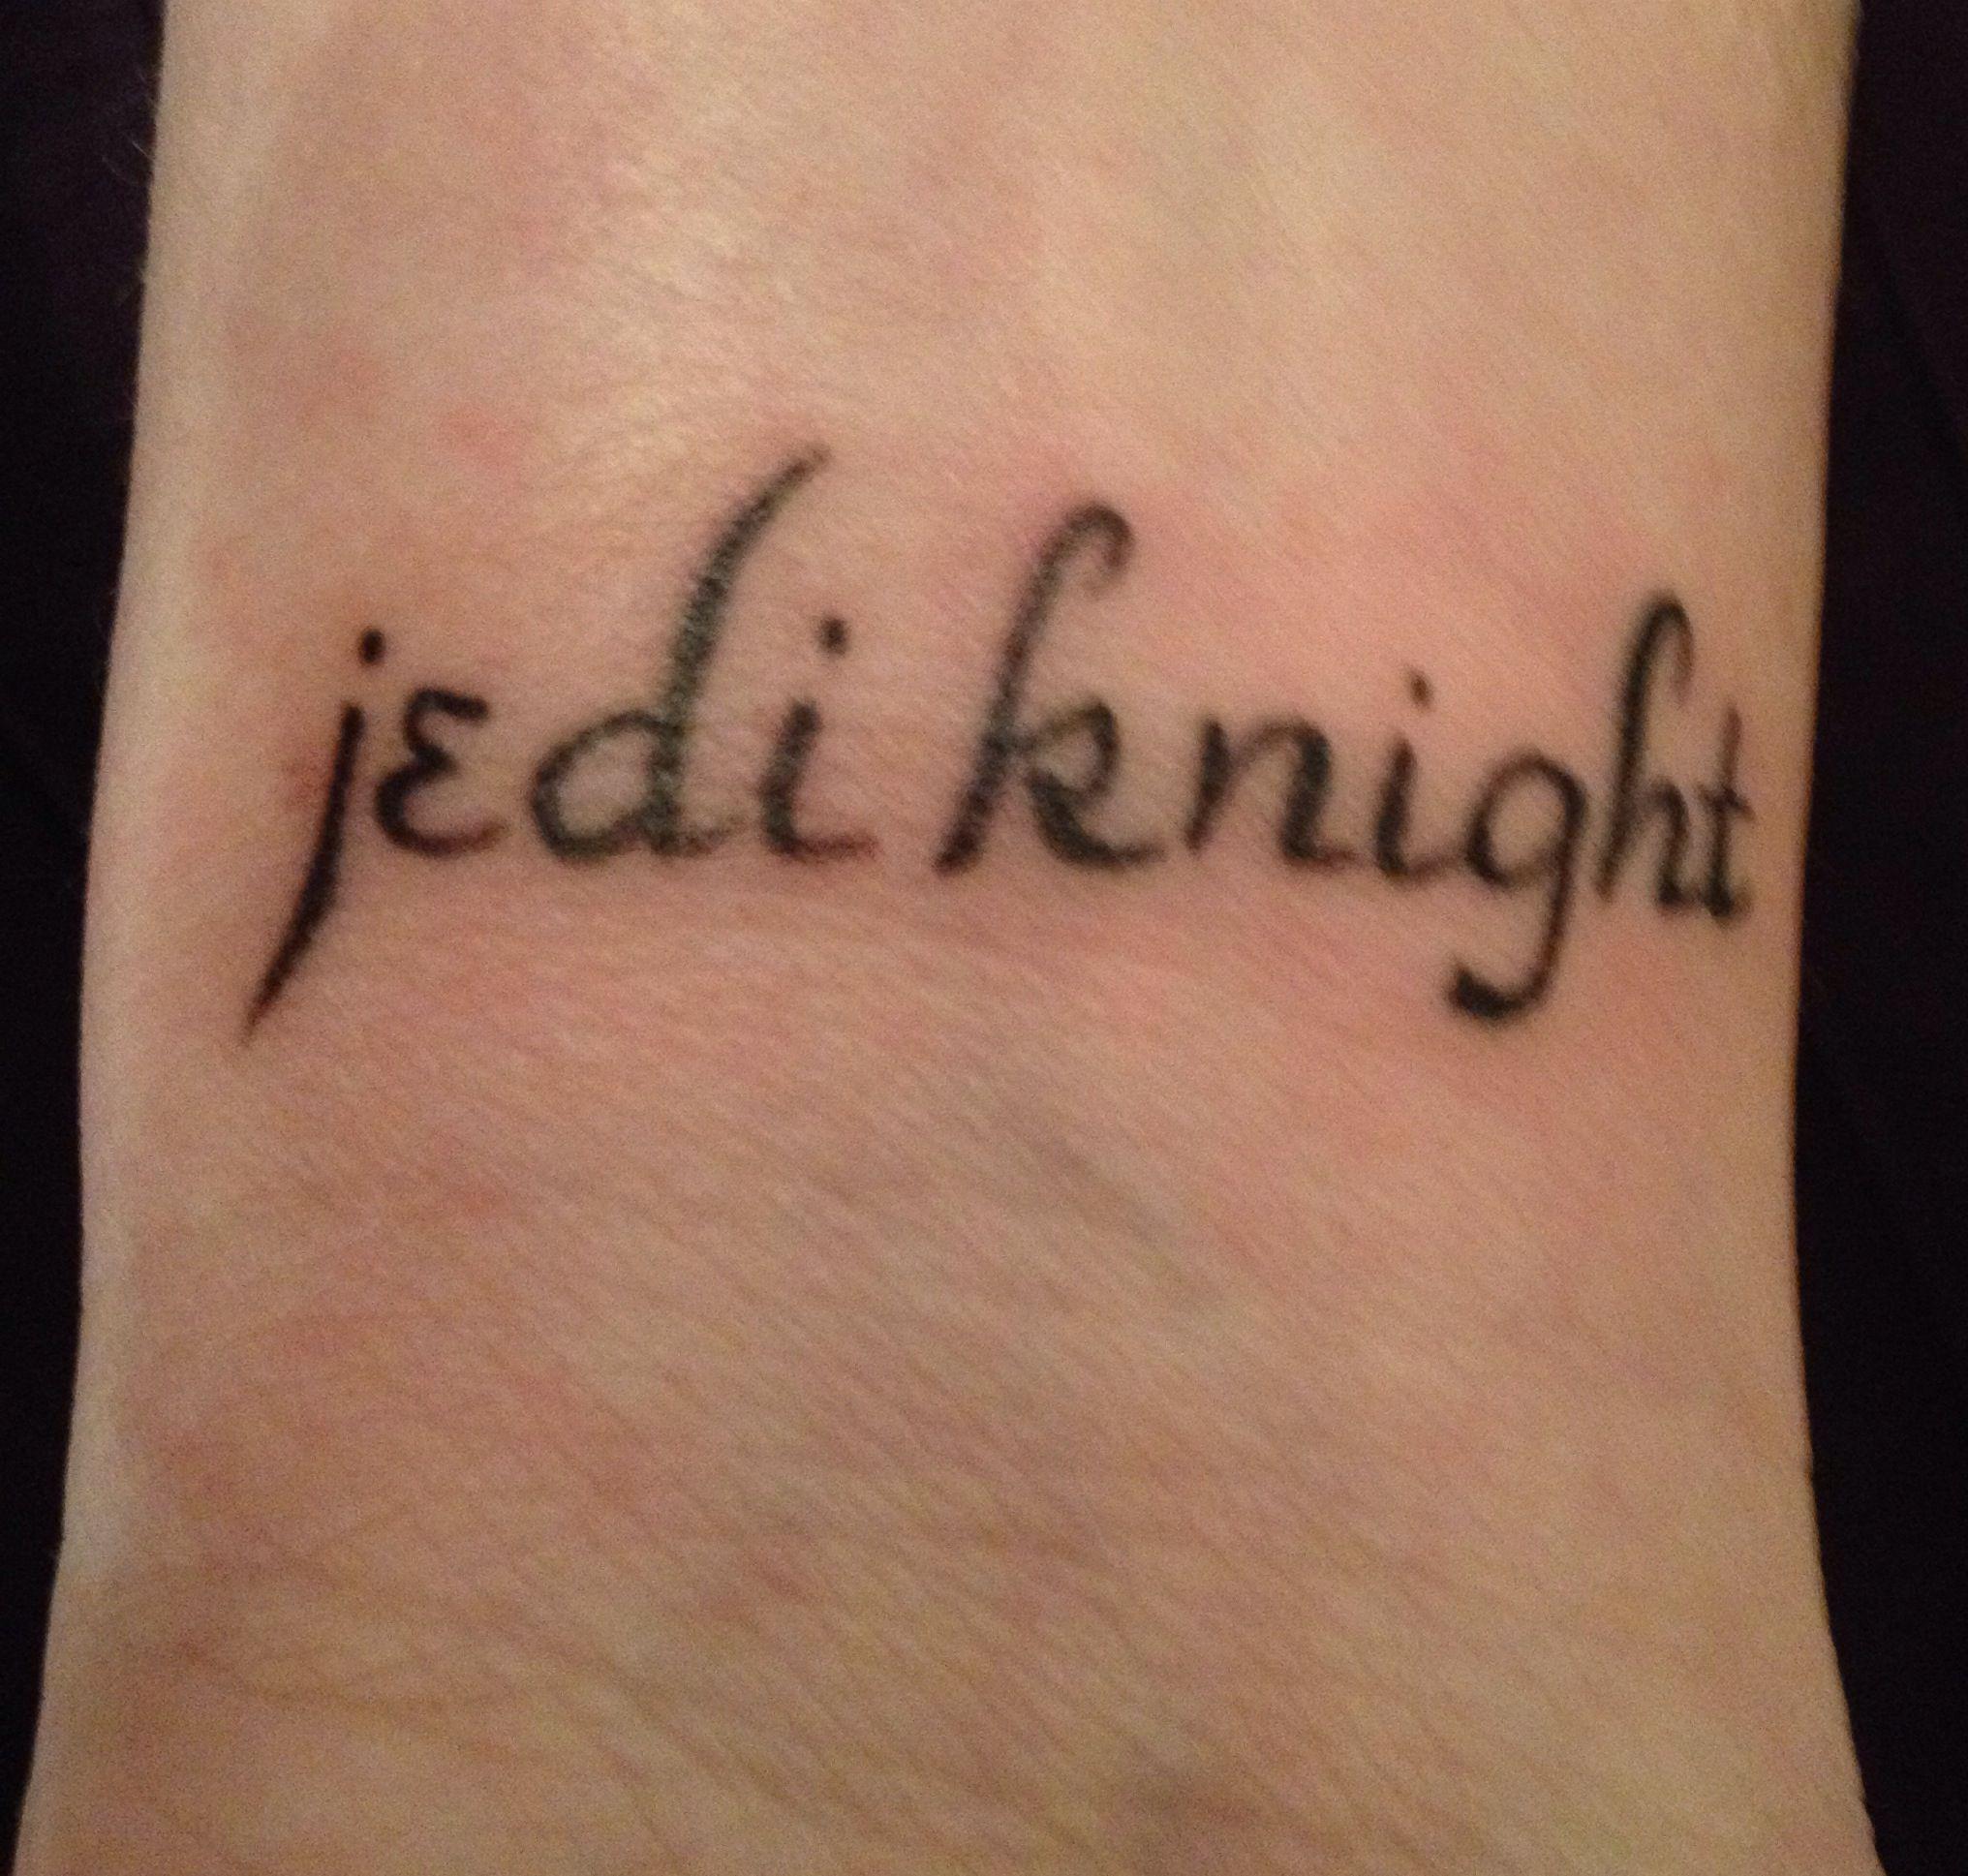 Jedi Knight Tat By Inksplosive Tattoo In Connecticut